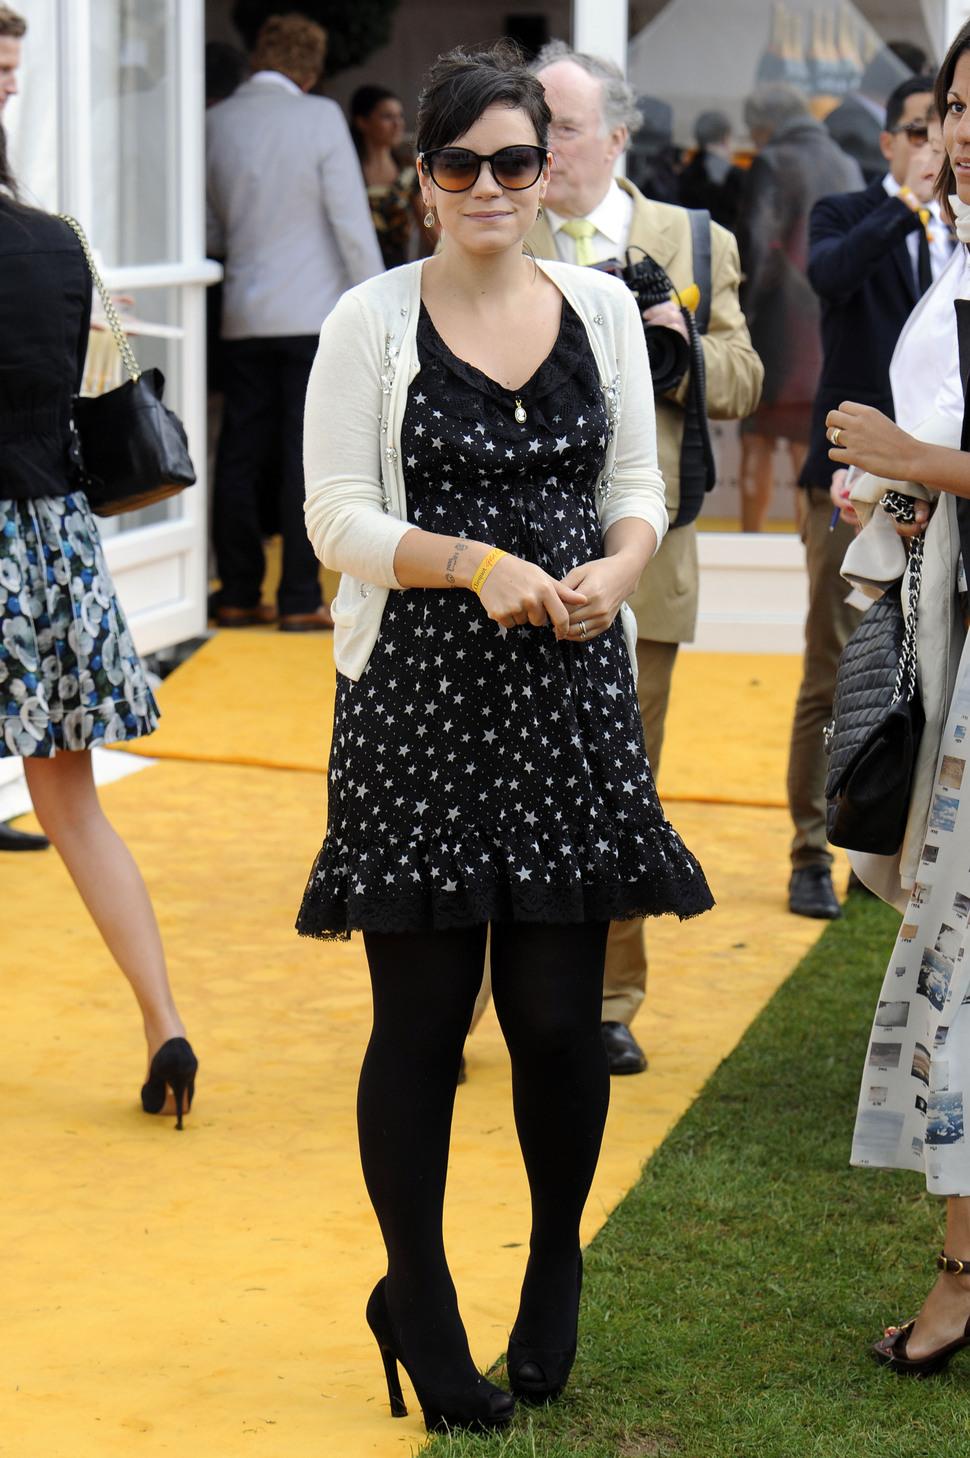 Лили Аллен закрыла свой магазин одежды Lucy In Disguise